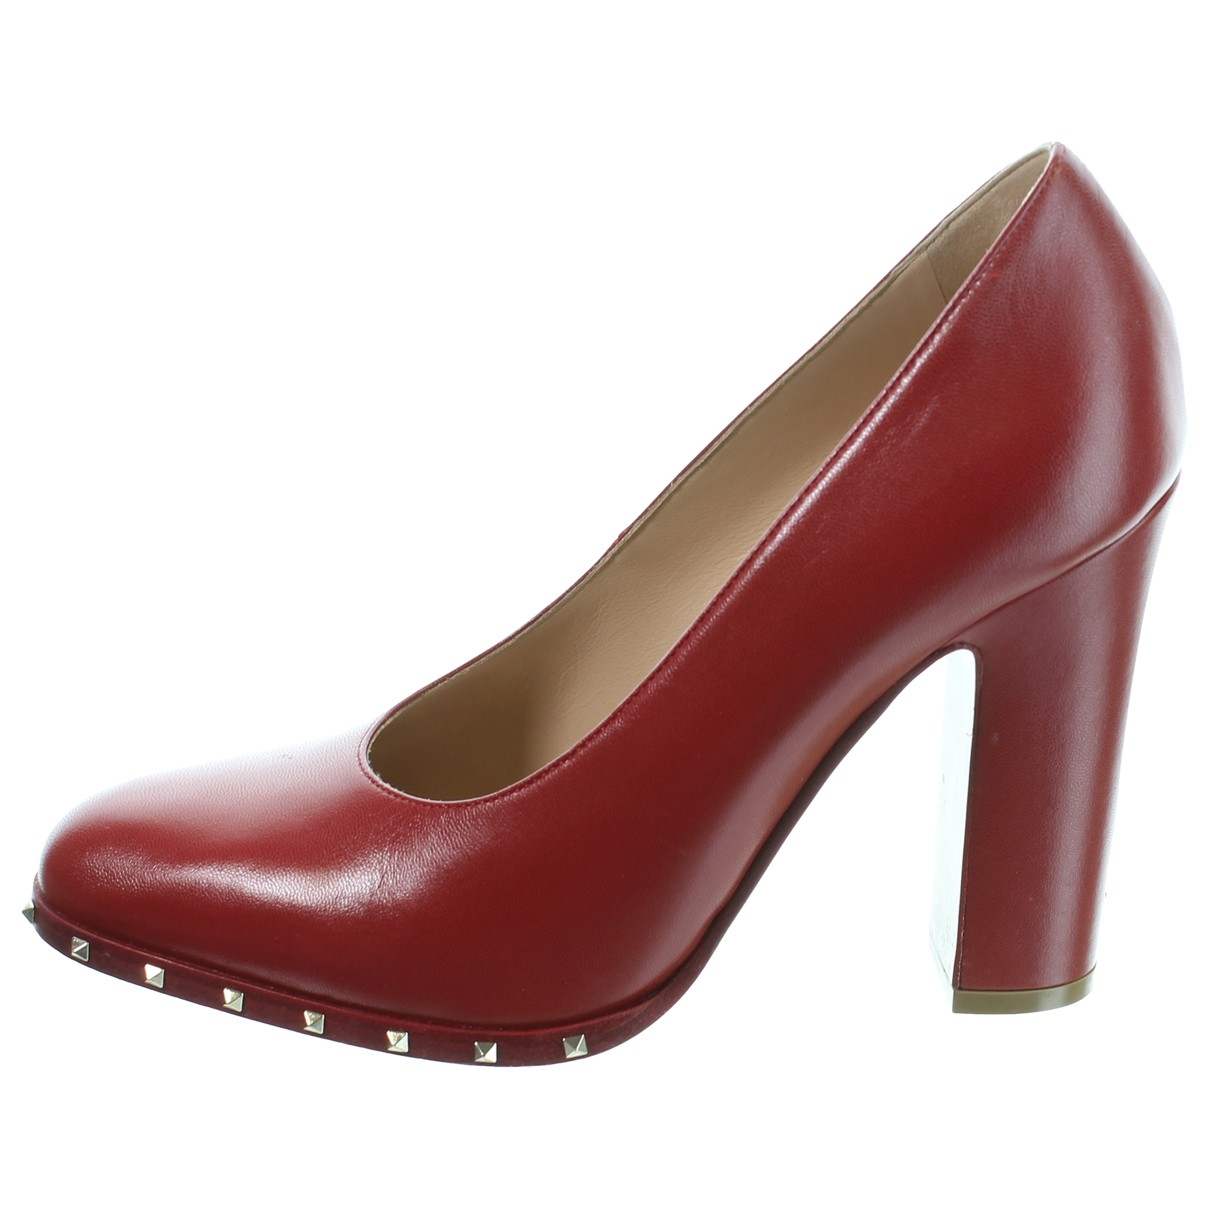 Valentino Garavani Rockstud Red Leather Heels for Women 37.5 EU